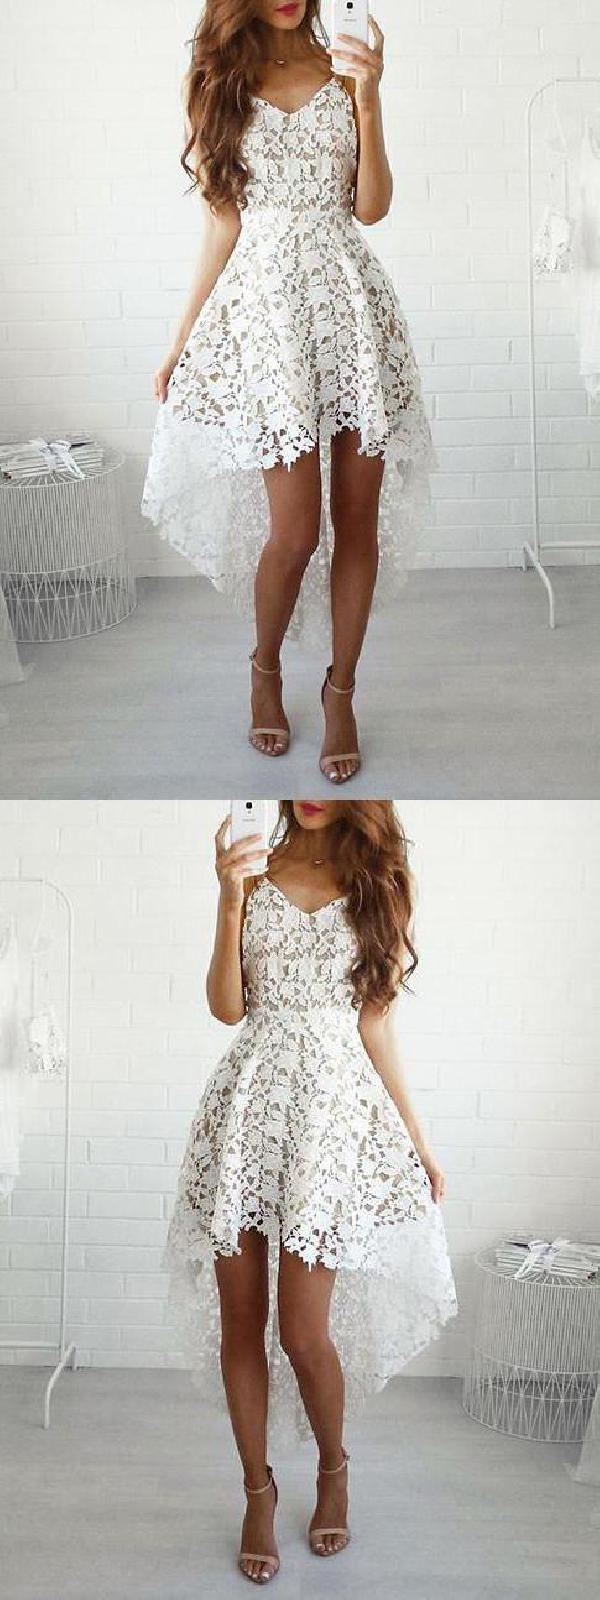 Comfortable prom dresses short asymmetrical homecoming dress short